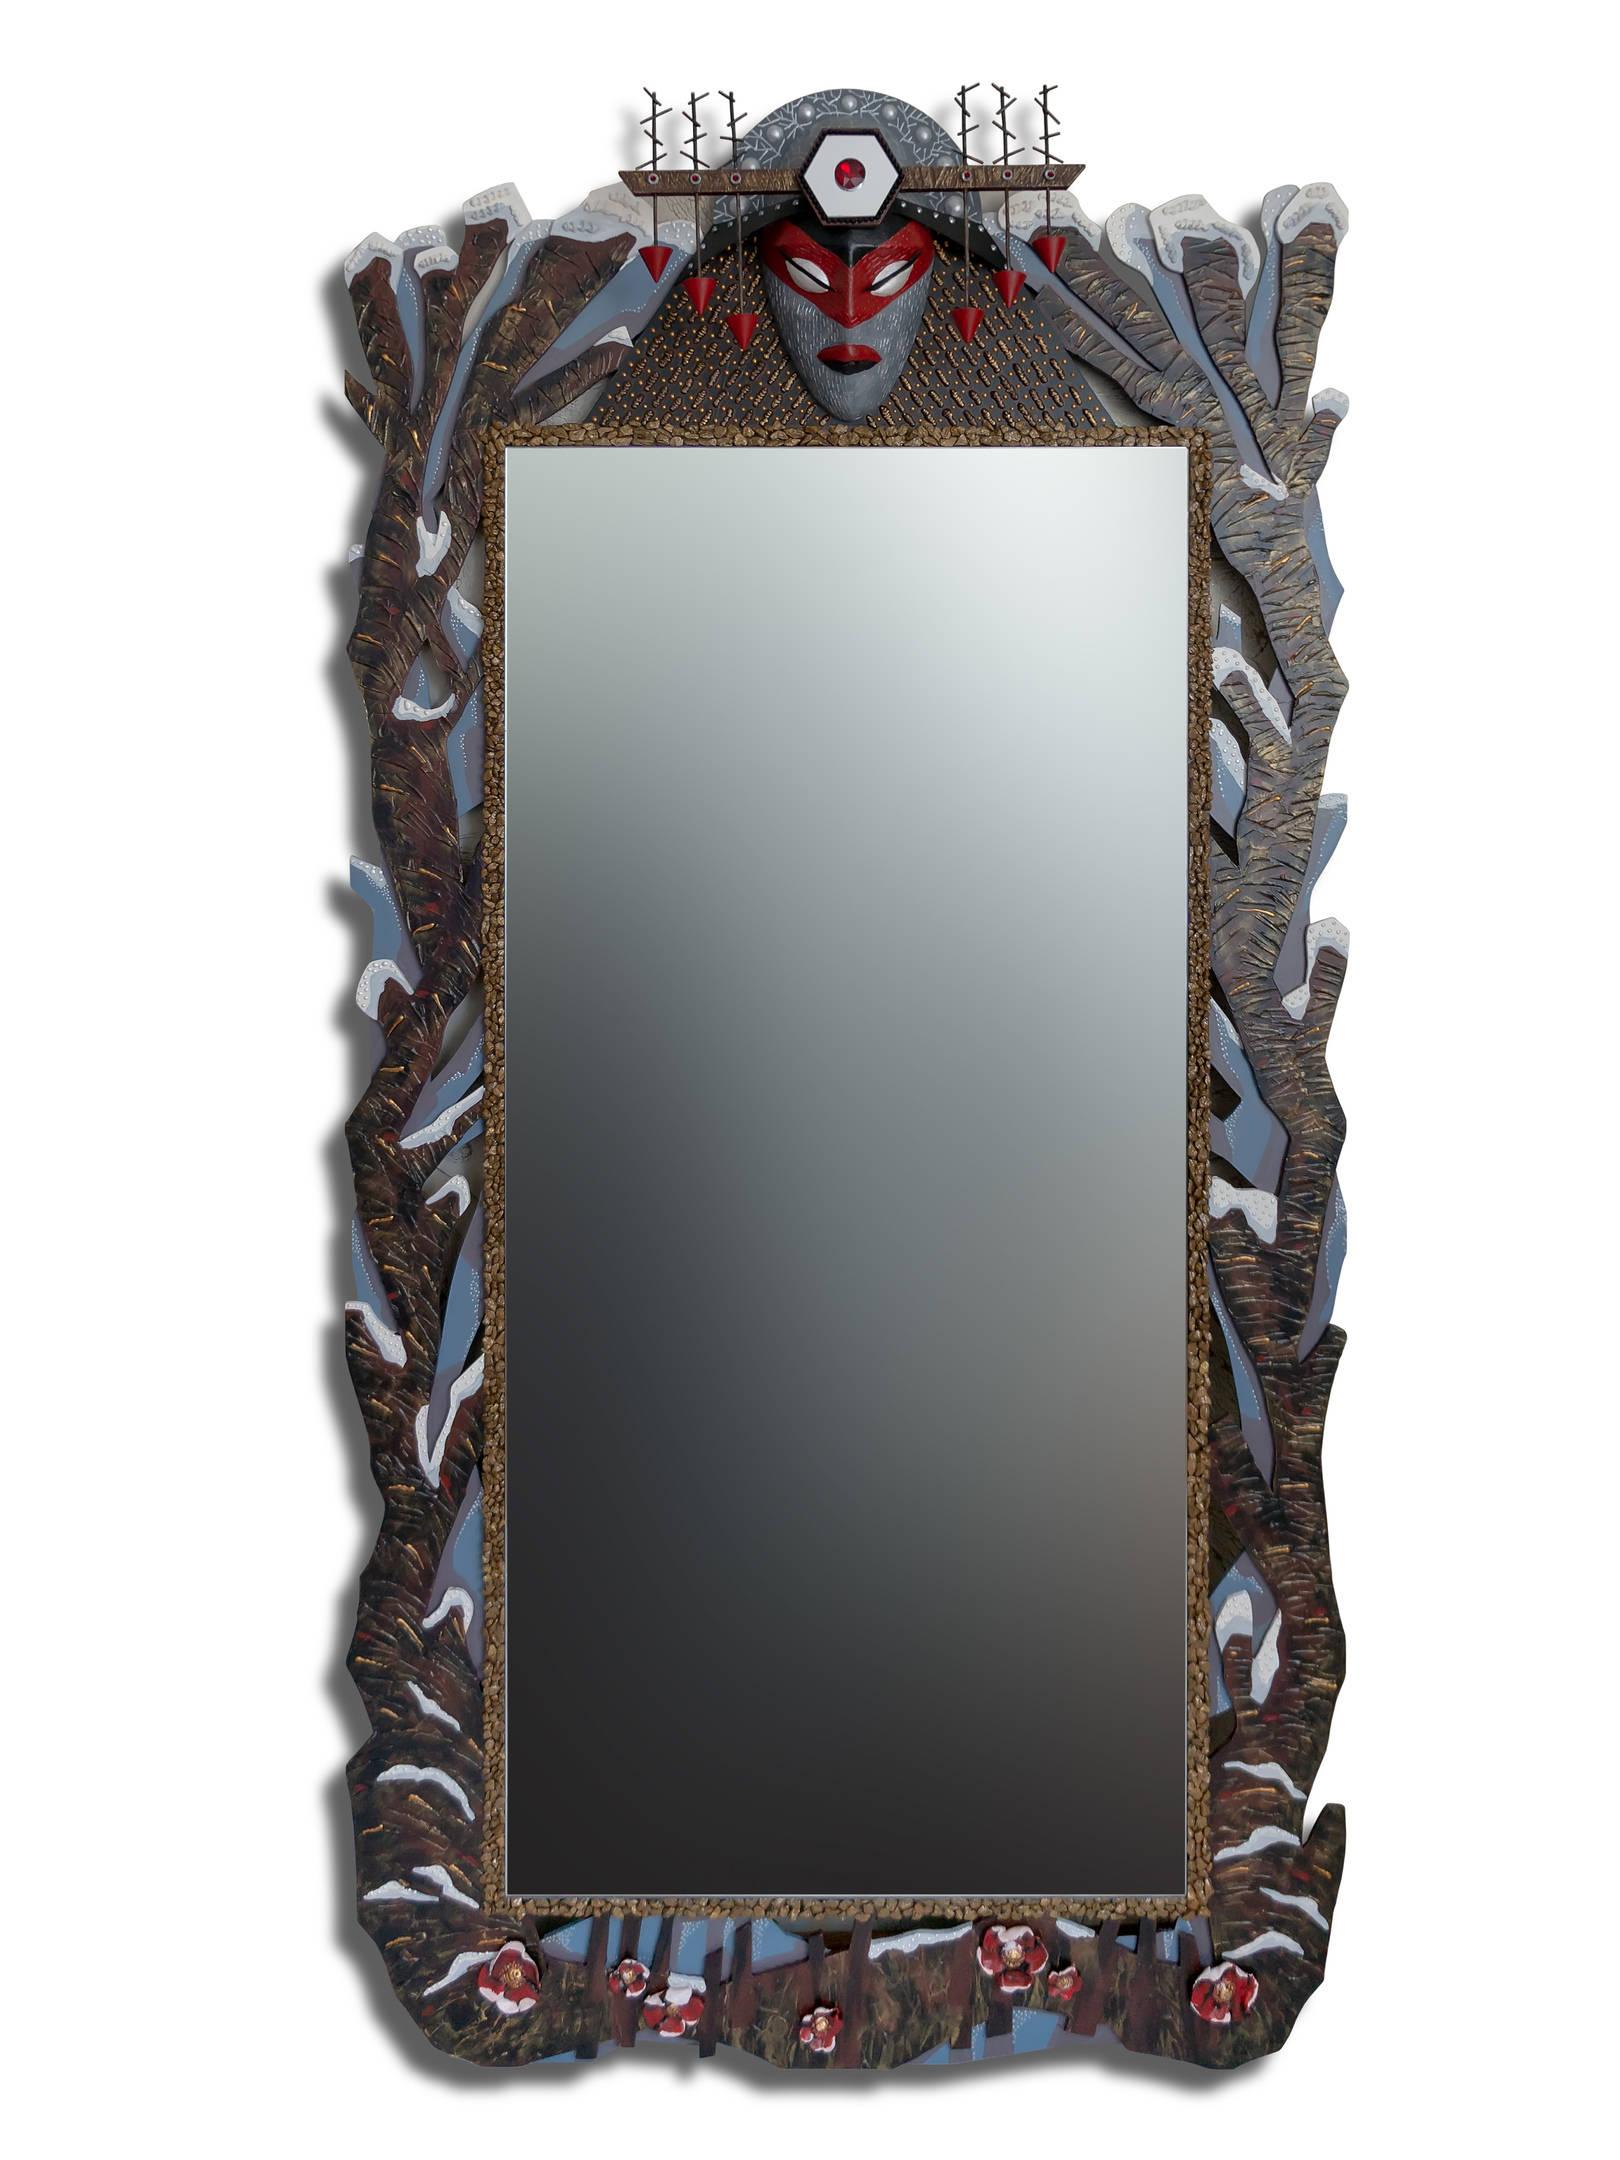 "зеркало « Первый снег » размер 1800 х 900 мм. размер зеркальной поверхности  1300 х 610 мм. Смешанная техника. mirror ""First Snow""  size 1800 x 900 mm. the size of the mirror surface is 1300 x 610 mm. Mixed media."